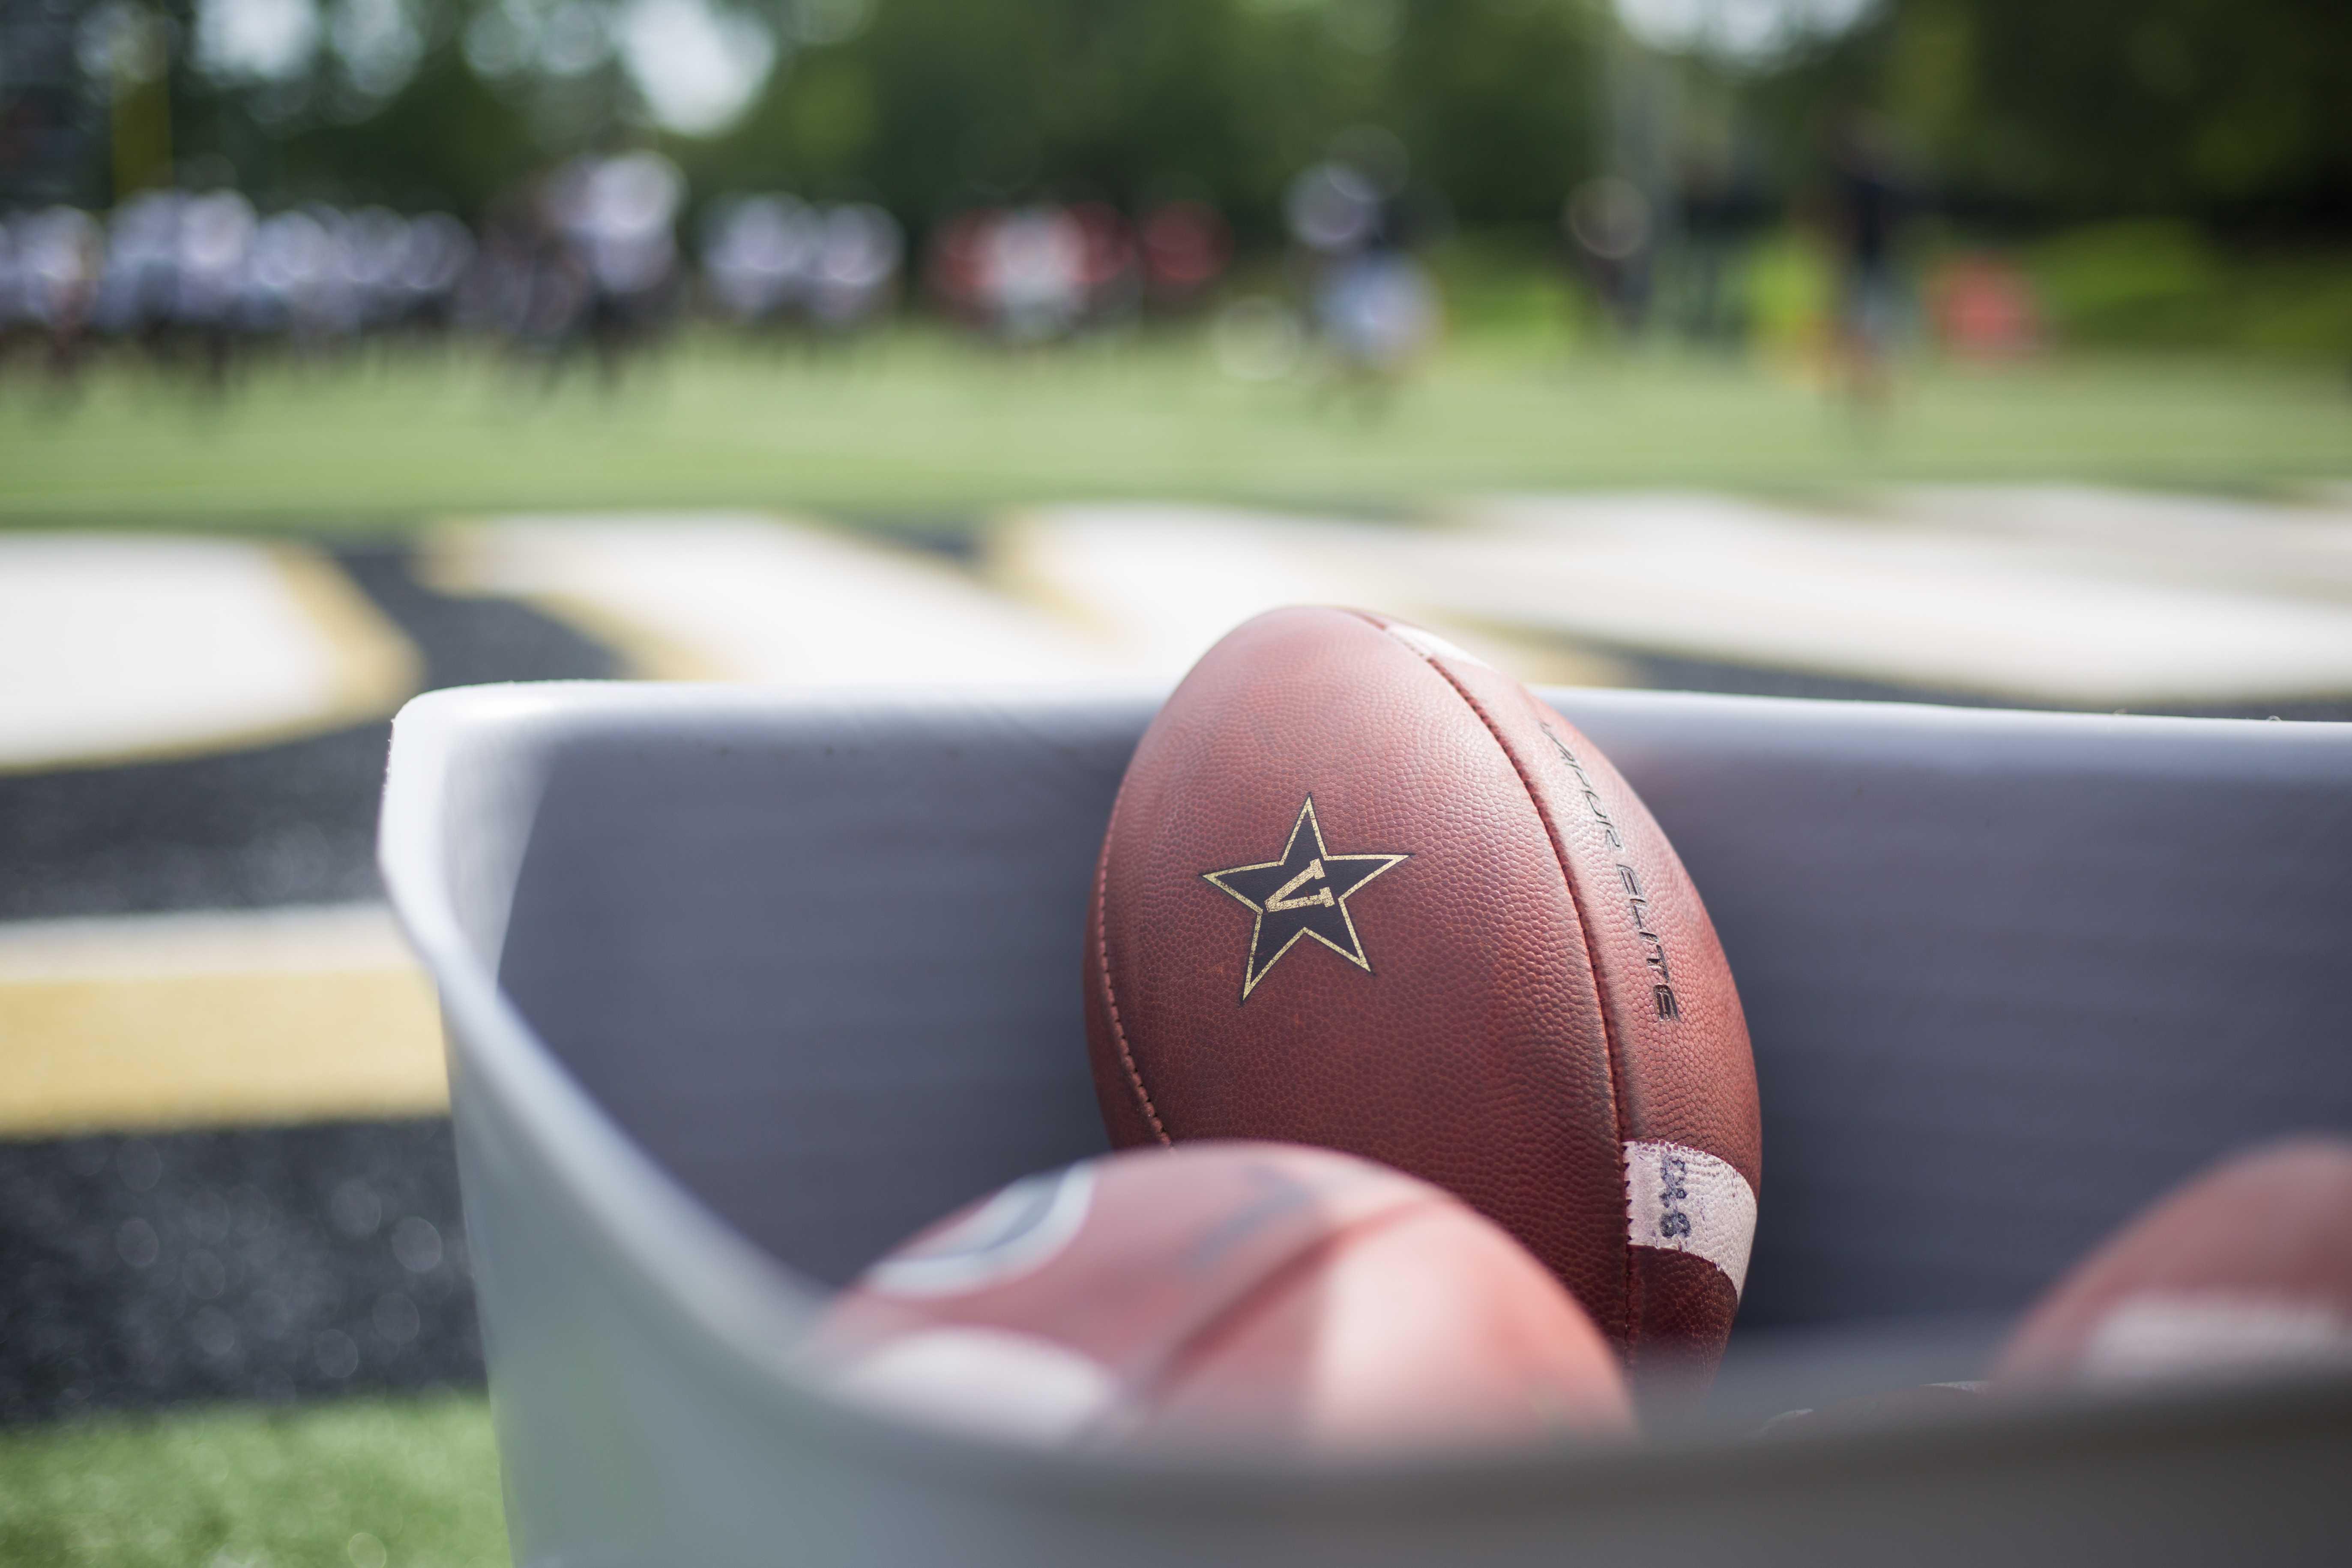 Vanderbilt football players practice on Thursday, August 16, 2018. (Photo by Claire Barnett)